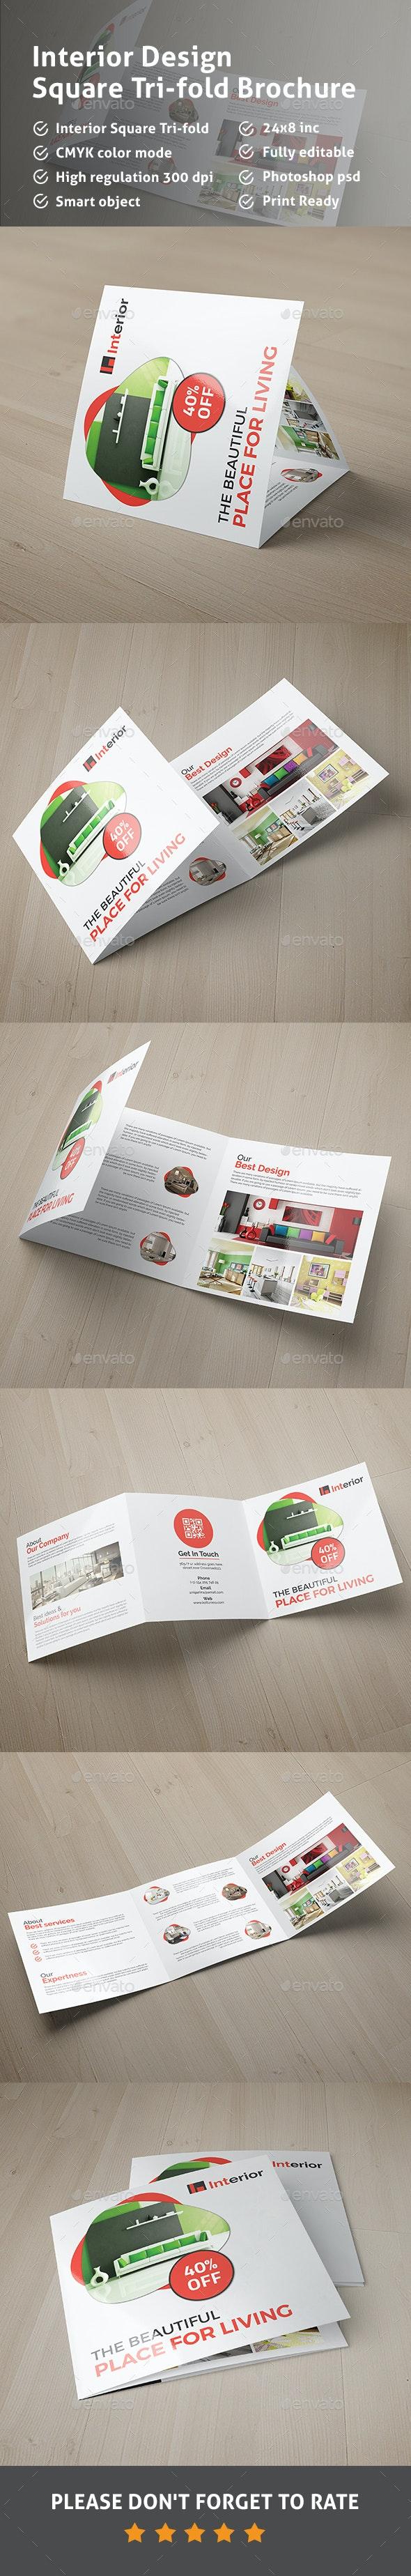 Square Trifold Brochure-Interior Design - Corporate Brochures